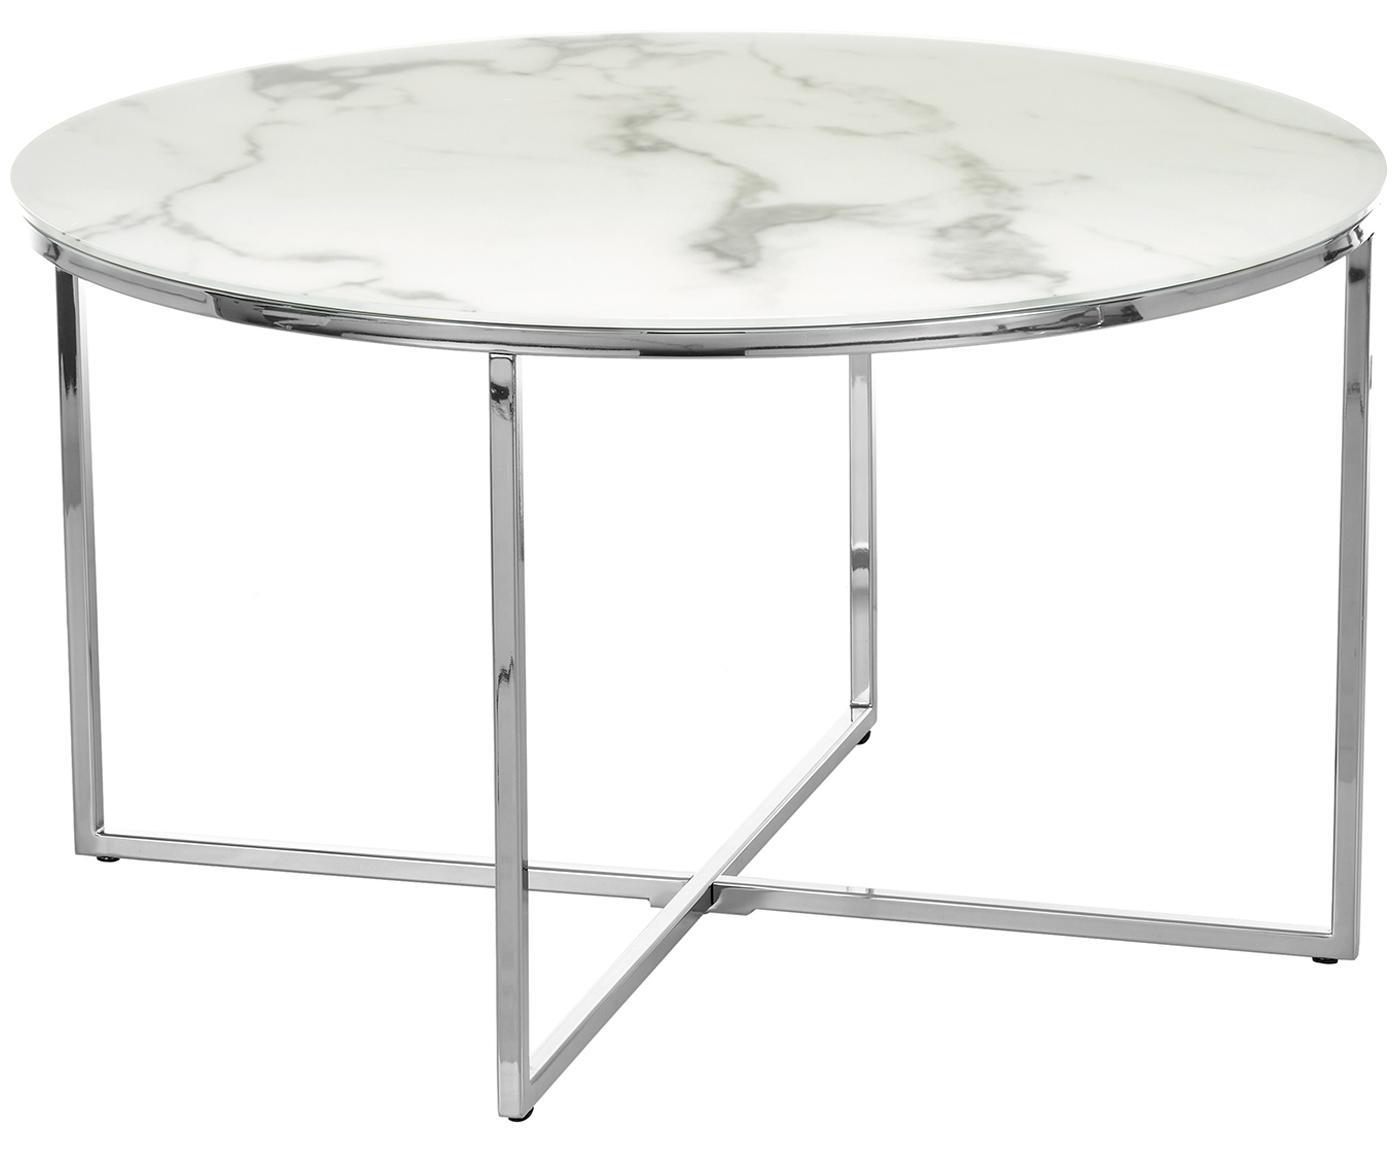 Salontafel Antigua met glazen tafelblad met marmerlook, Tafelblad: mat bedrukt glas, Frame: verchroomd staal, Tafelblad: melkachtig, marmeren print. Frame: chroom, Ø 80 x H 45 cm